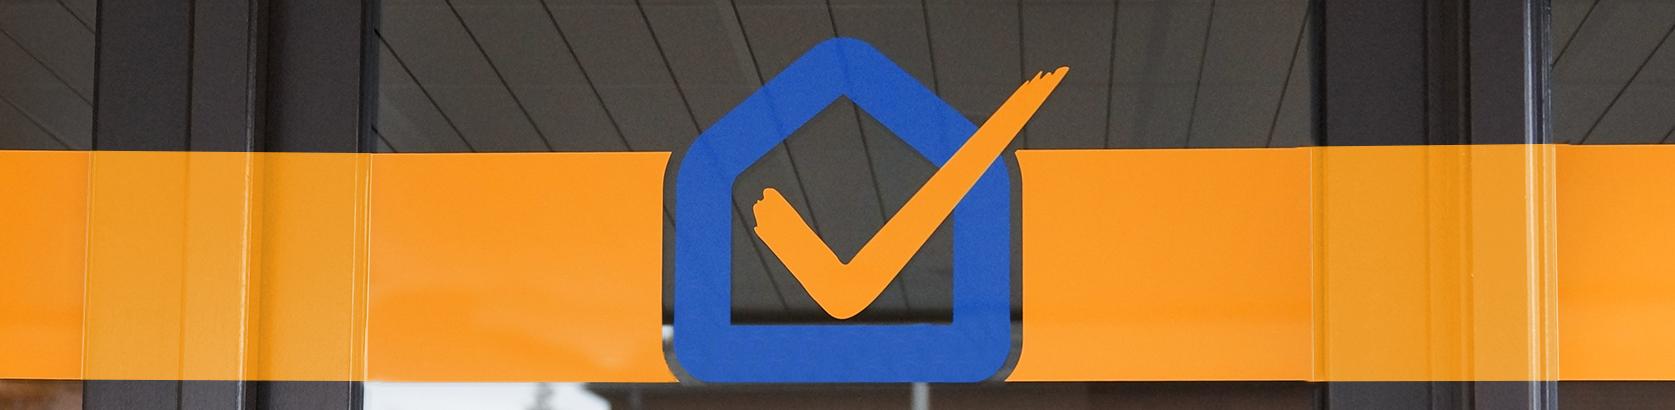 Leeser & Will Schädlingsbekämpfung GmbH - Logo Tür